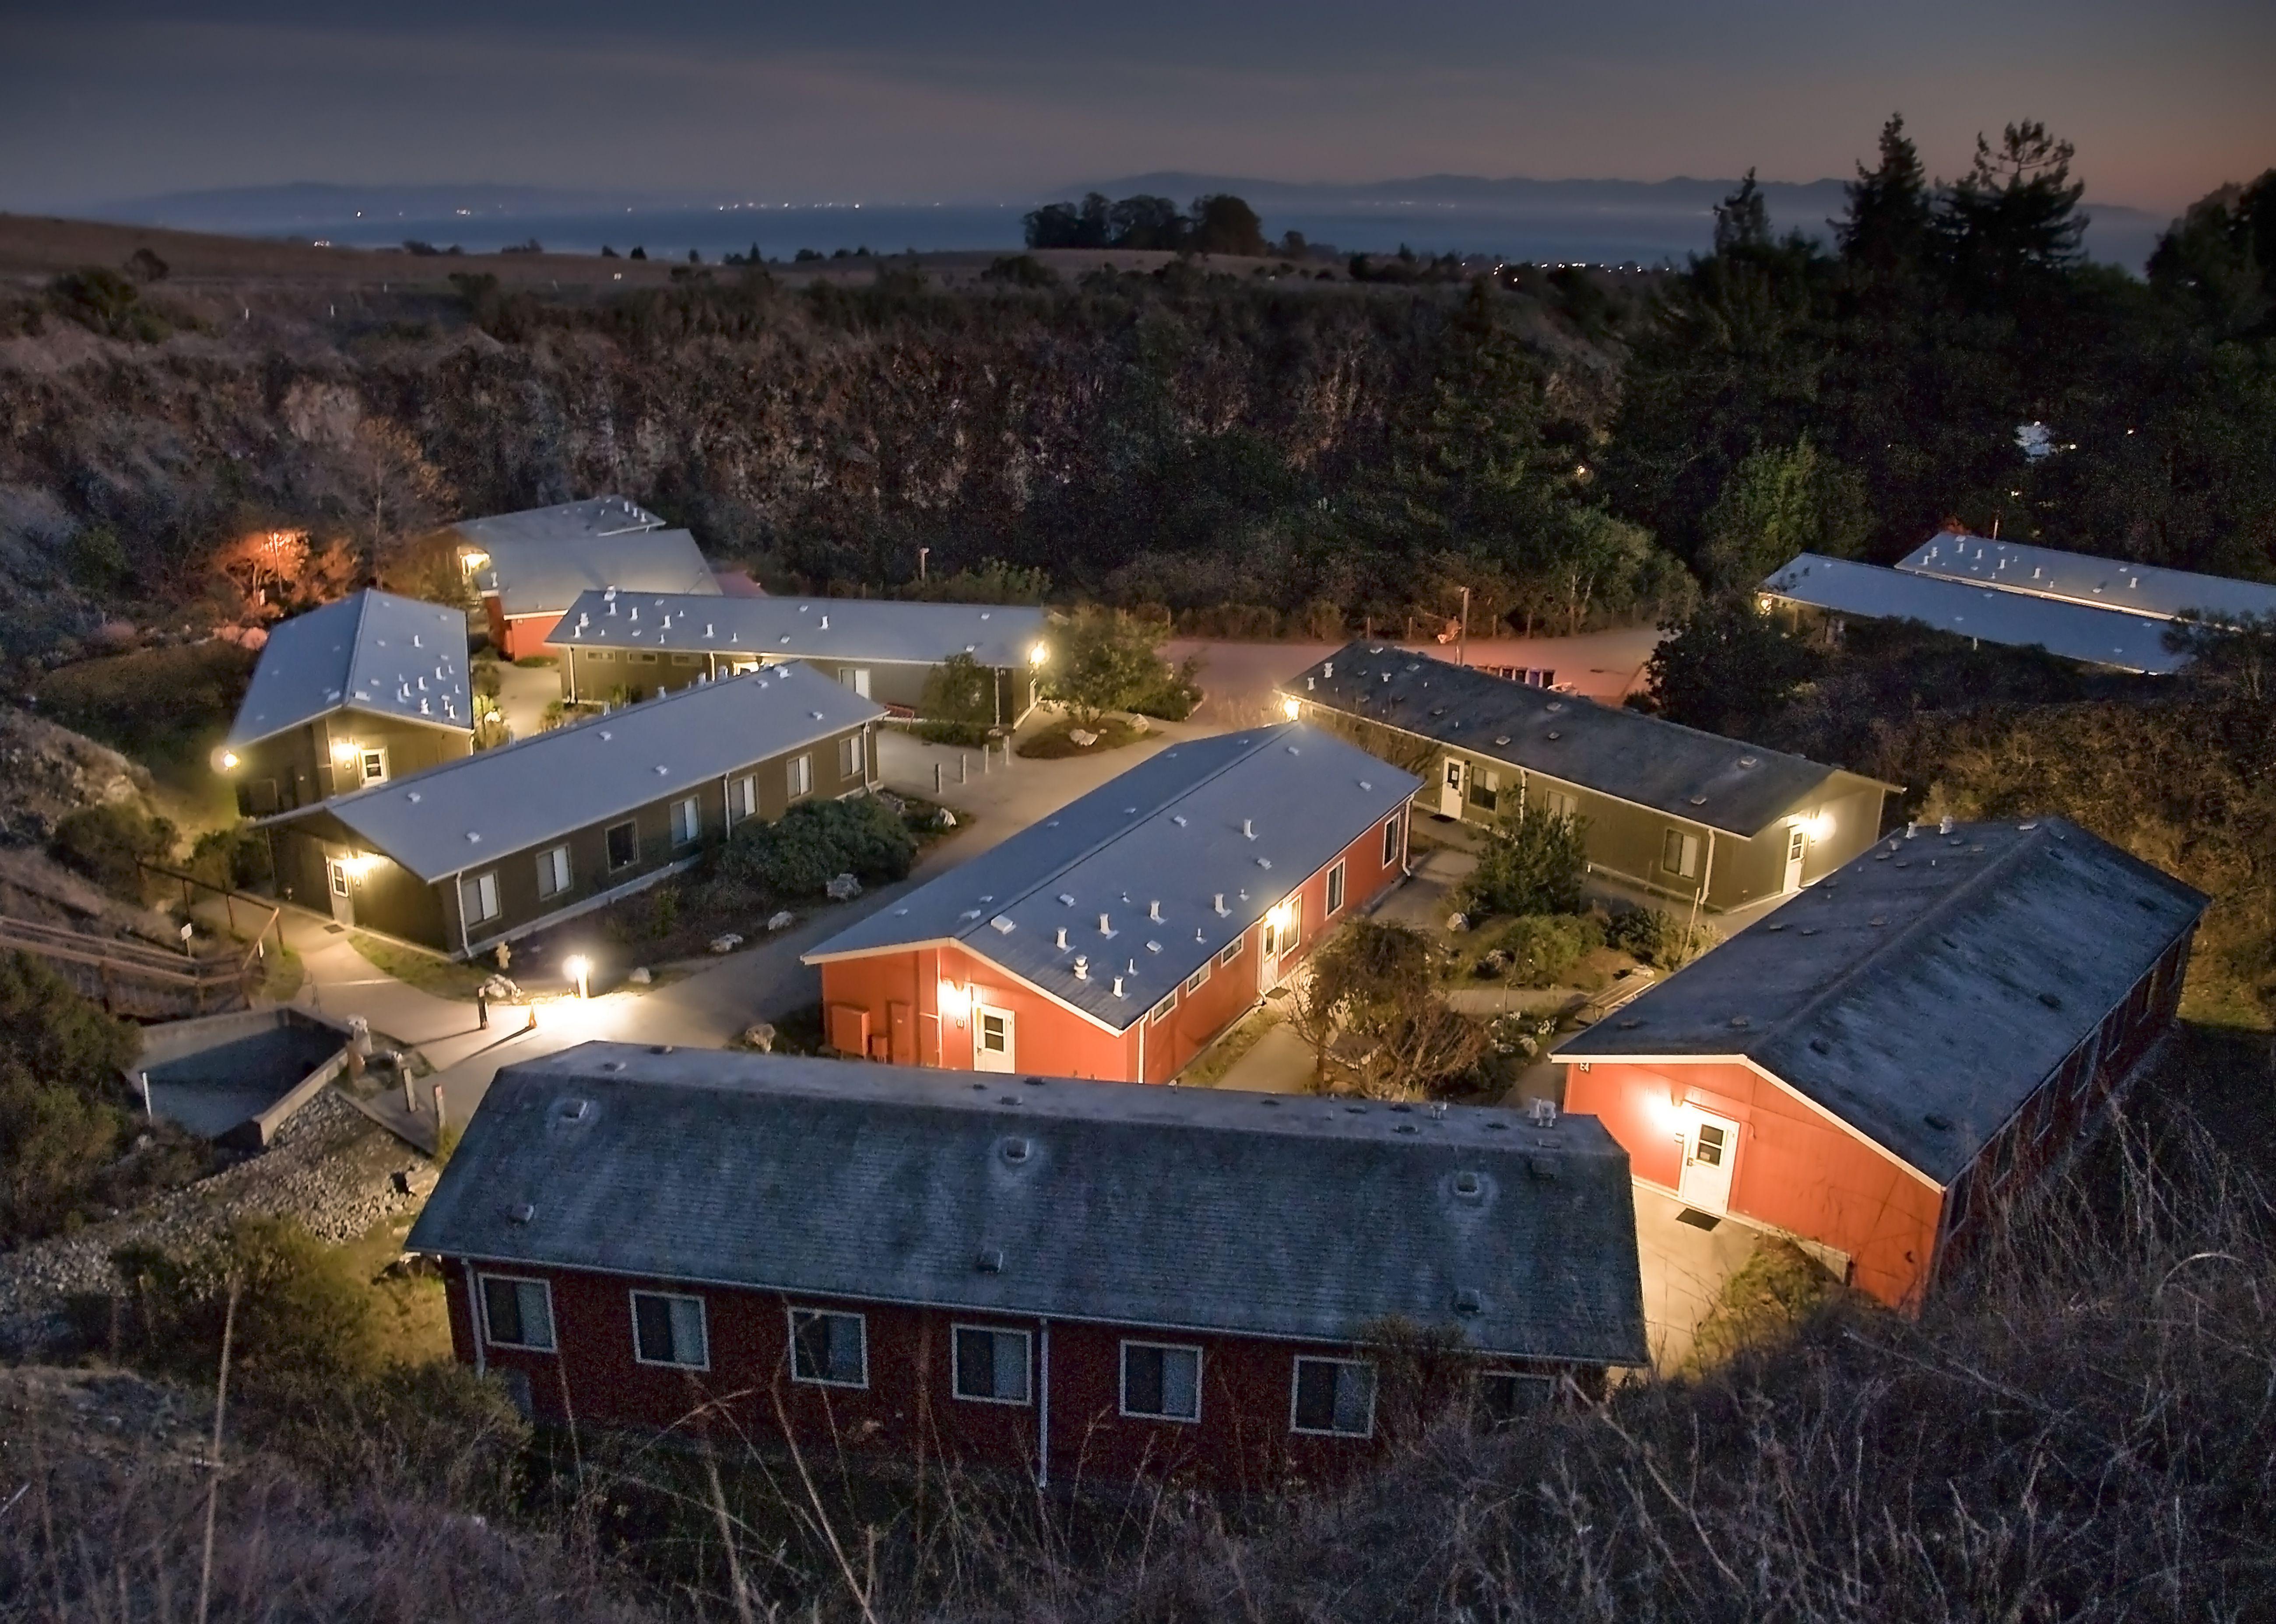 The Quarry Village Housing Community UC Santa Cruz